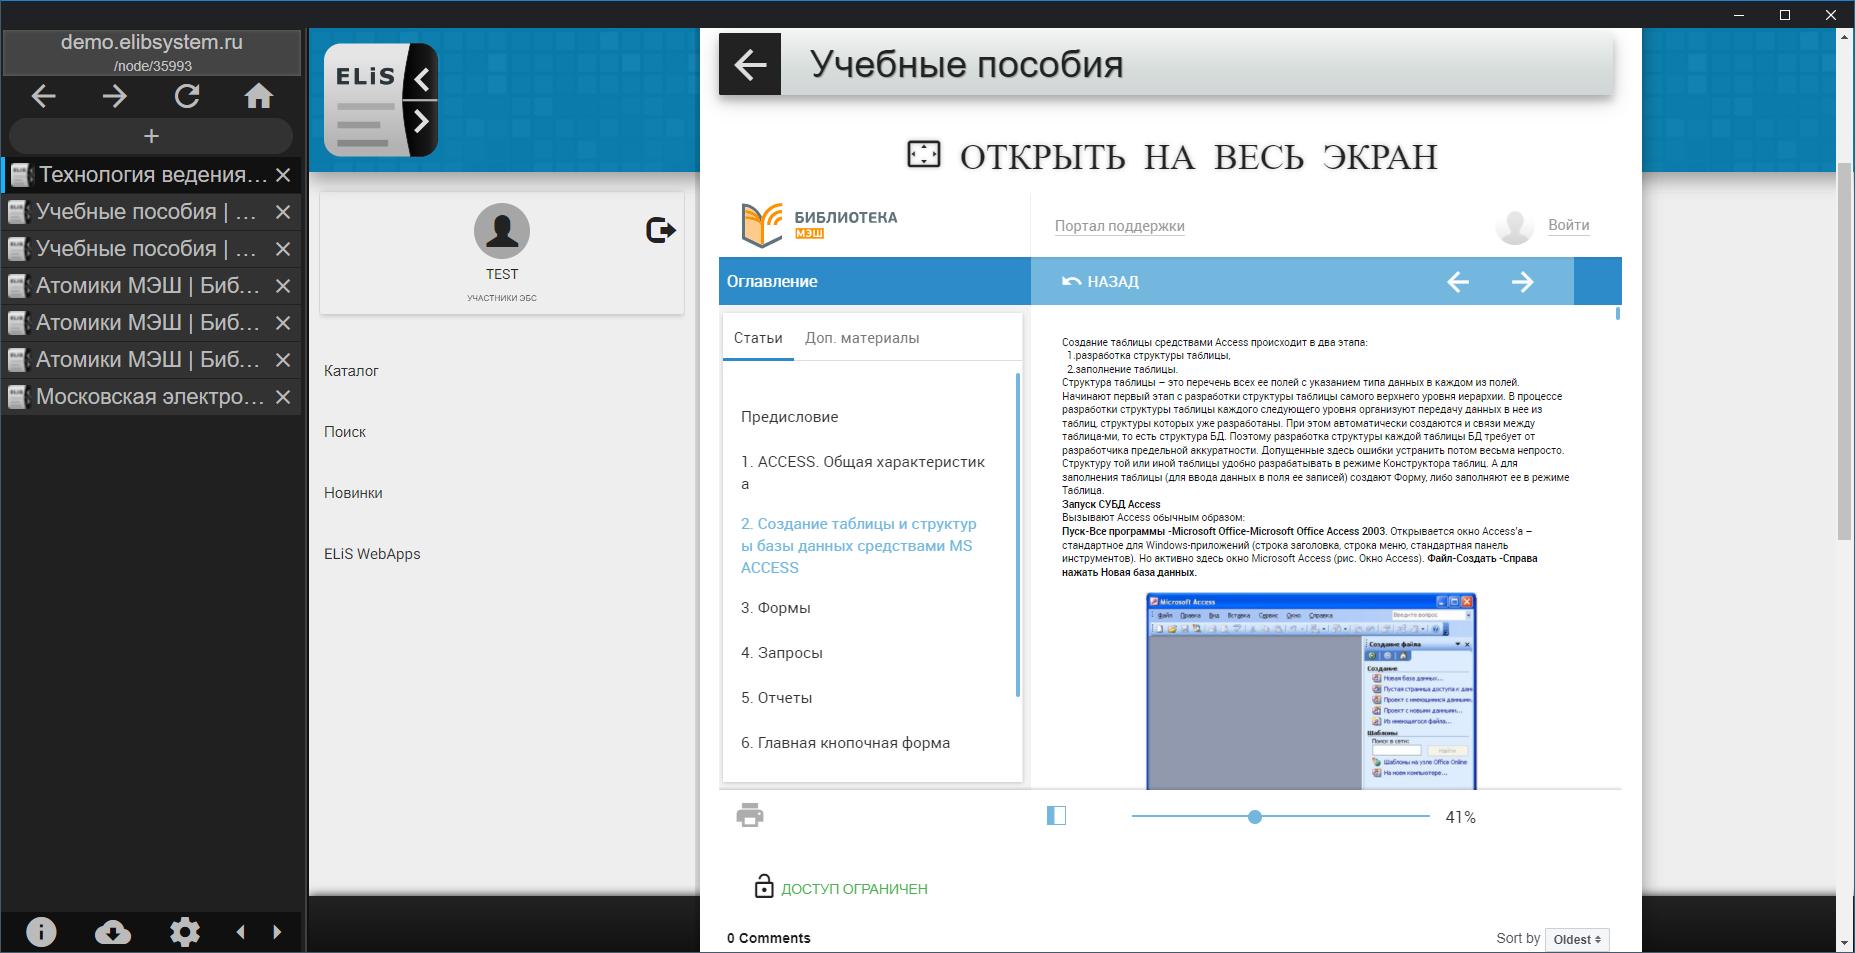 uchebnik-mos.ru2.png